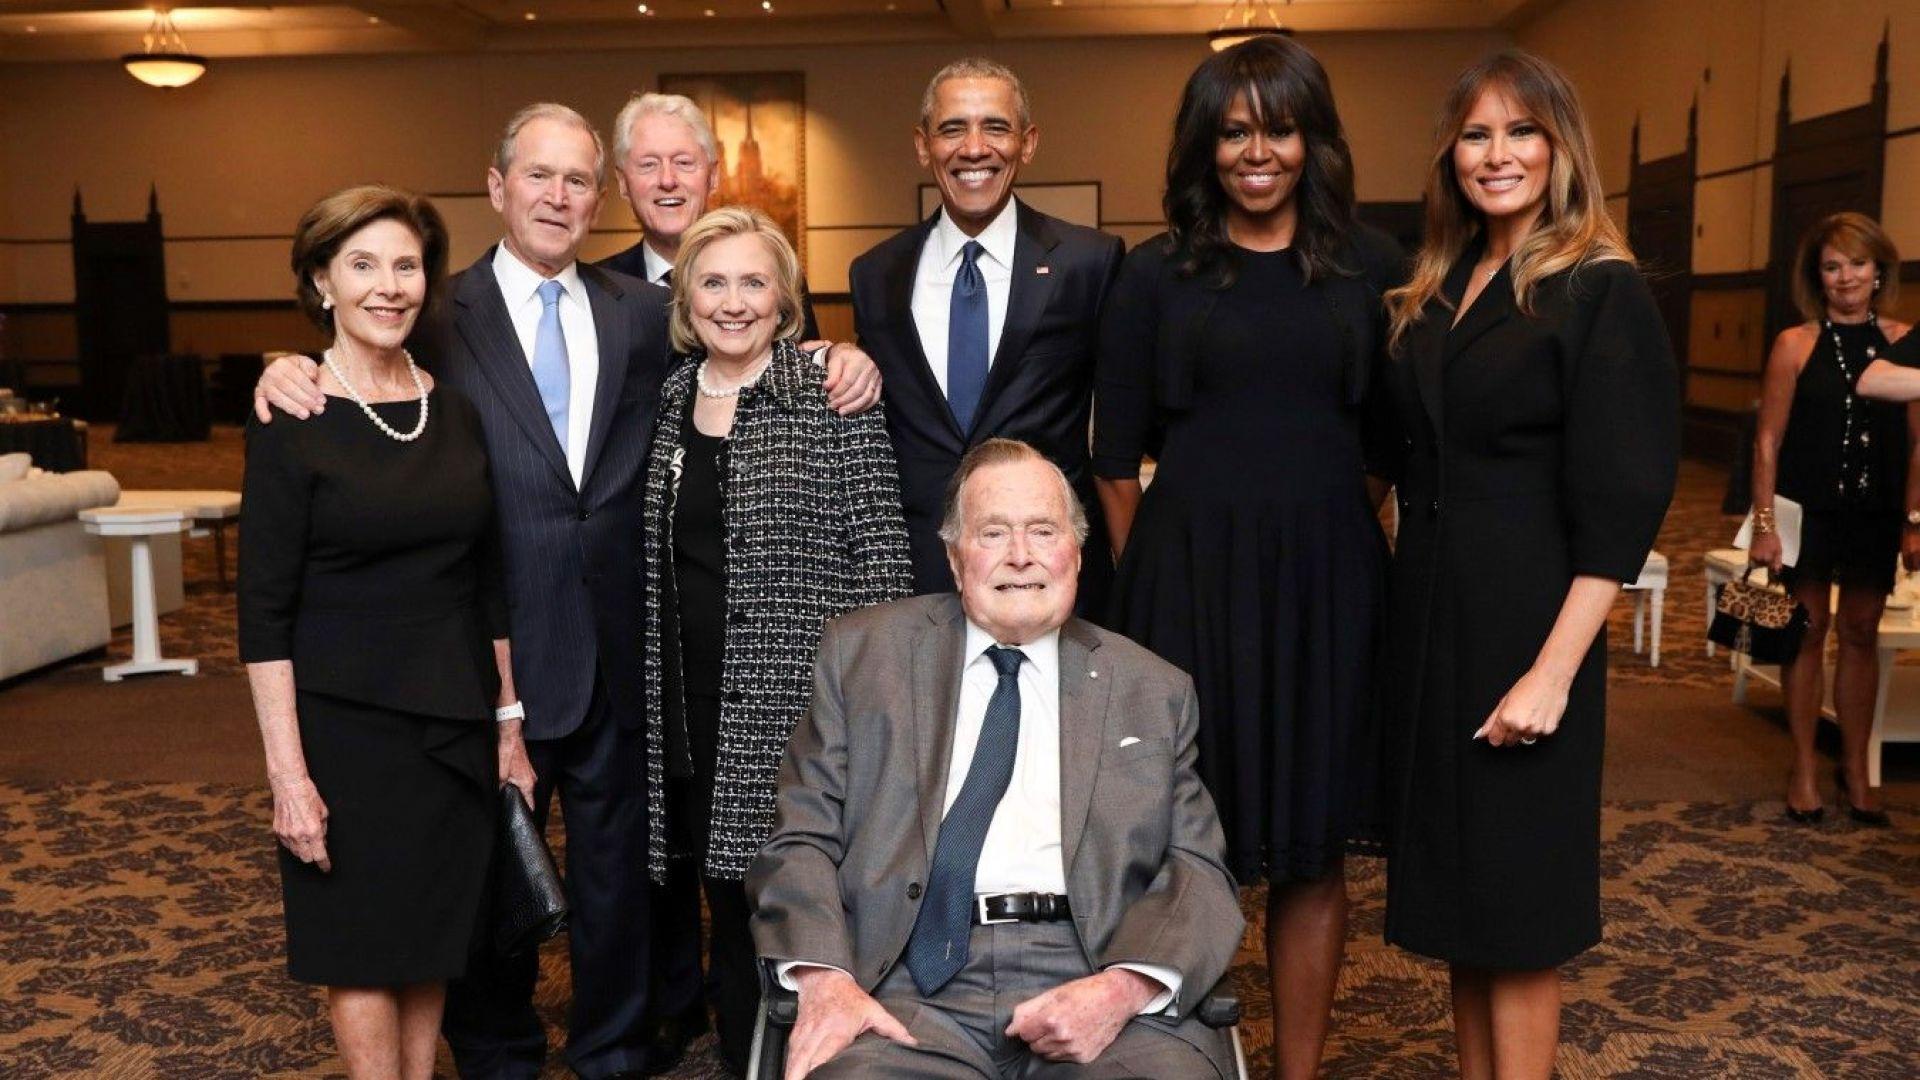 Четирима бивши президенти изпратиха Барбара Буш